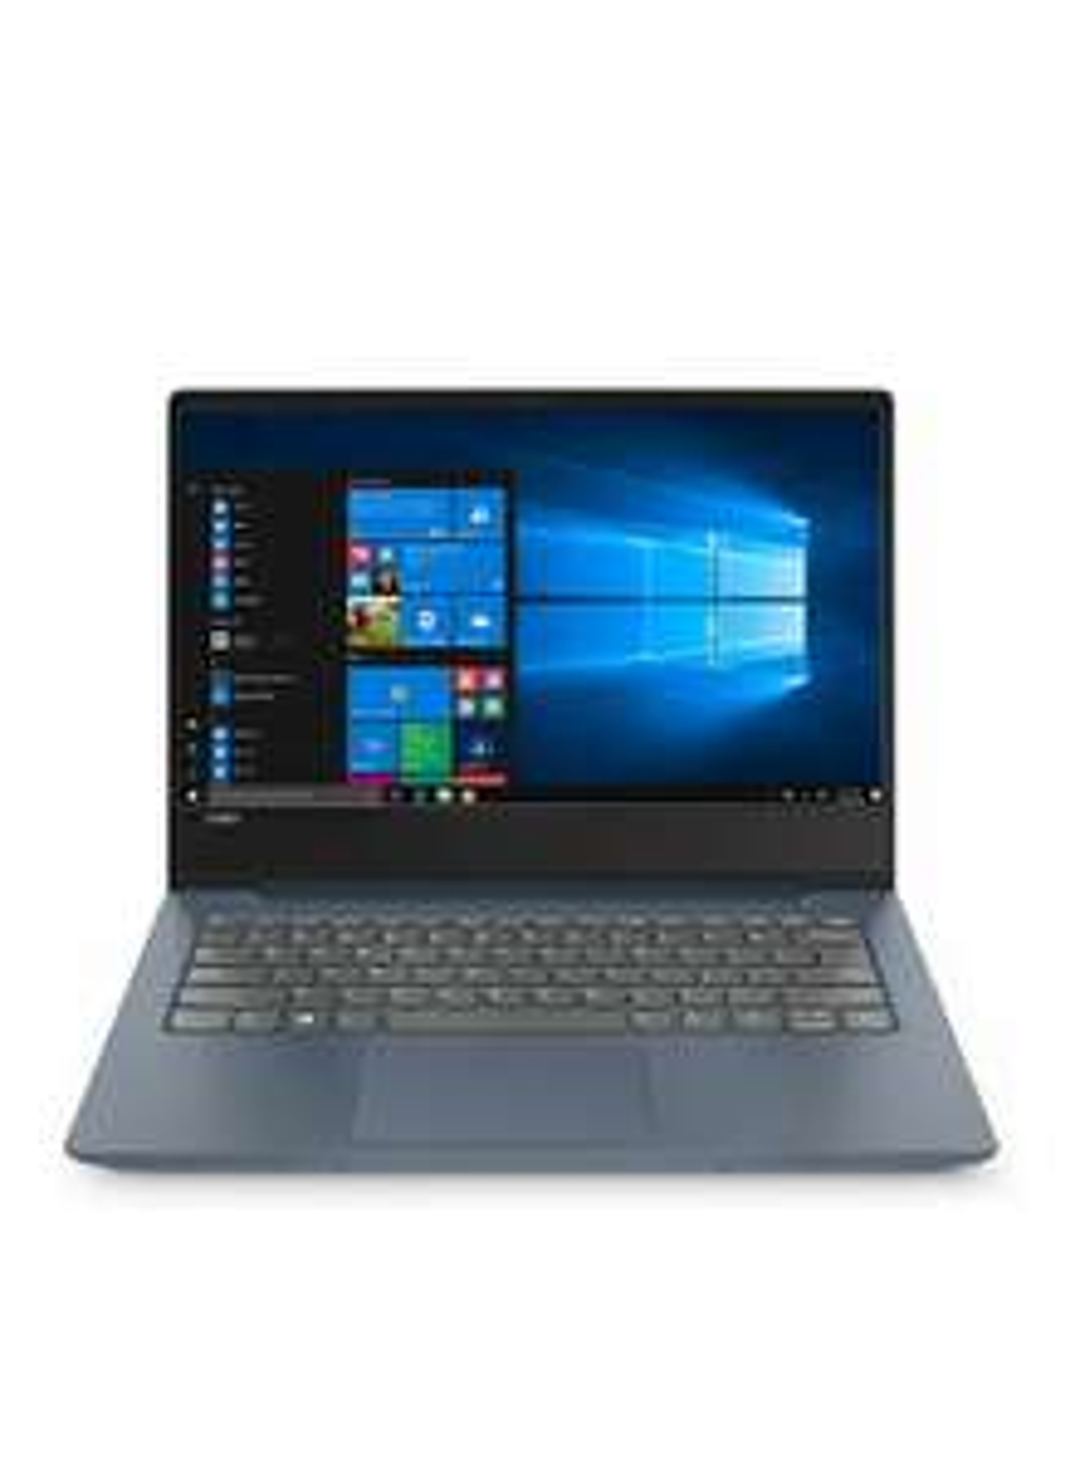 "PC Portable 14"" Lenovo Ideapad 330S-14IKB - i3-7120U, 4 Go RAM, SSD 128 Go"